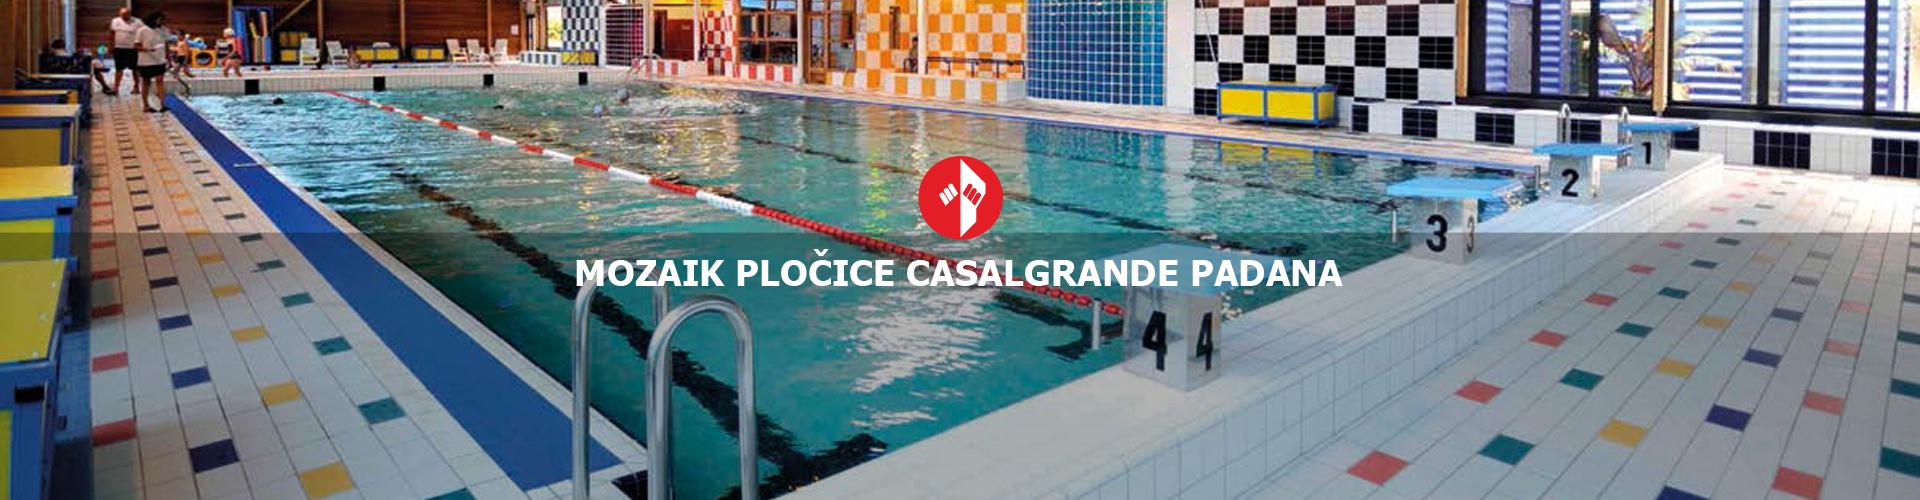 Mozaik pločice Casalgrande Padana